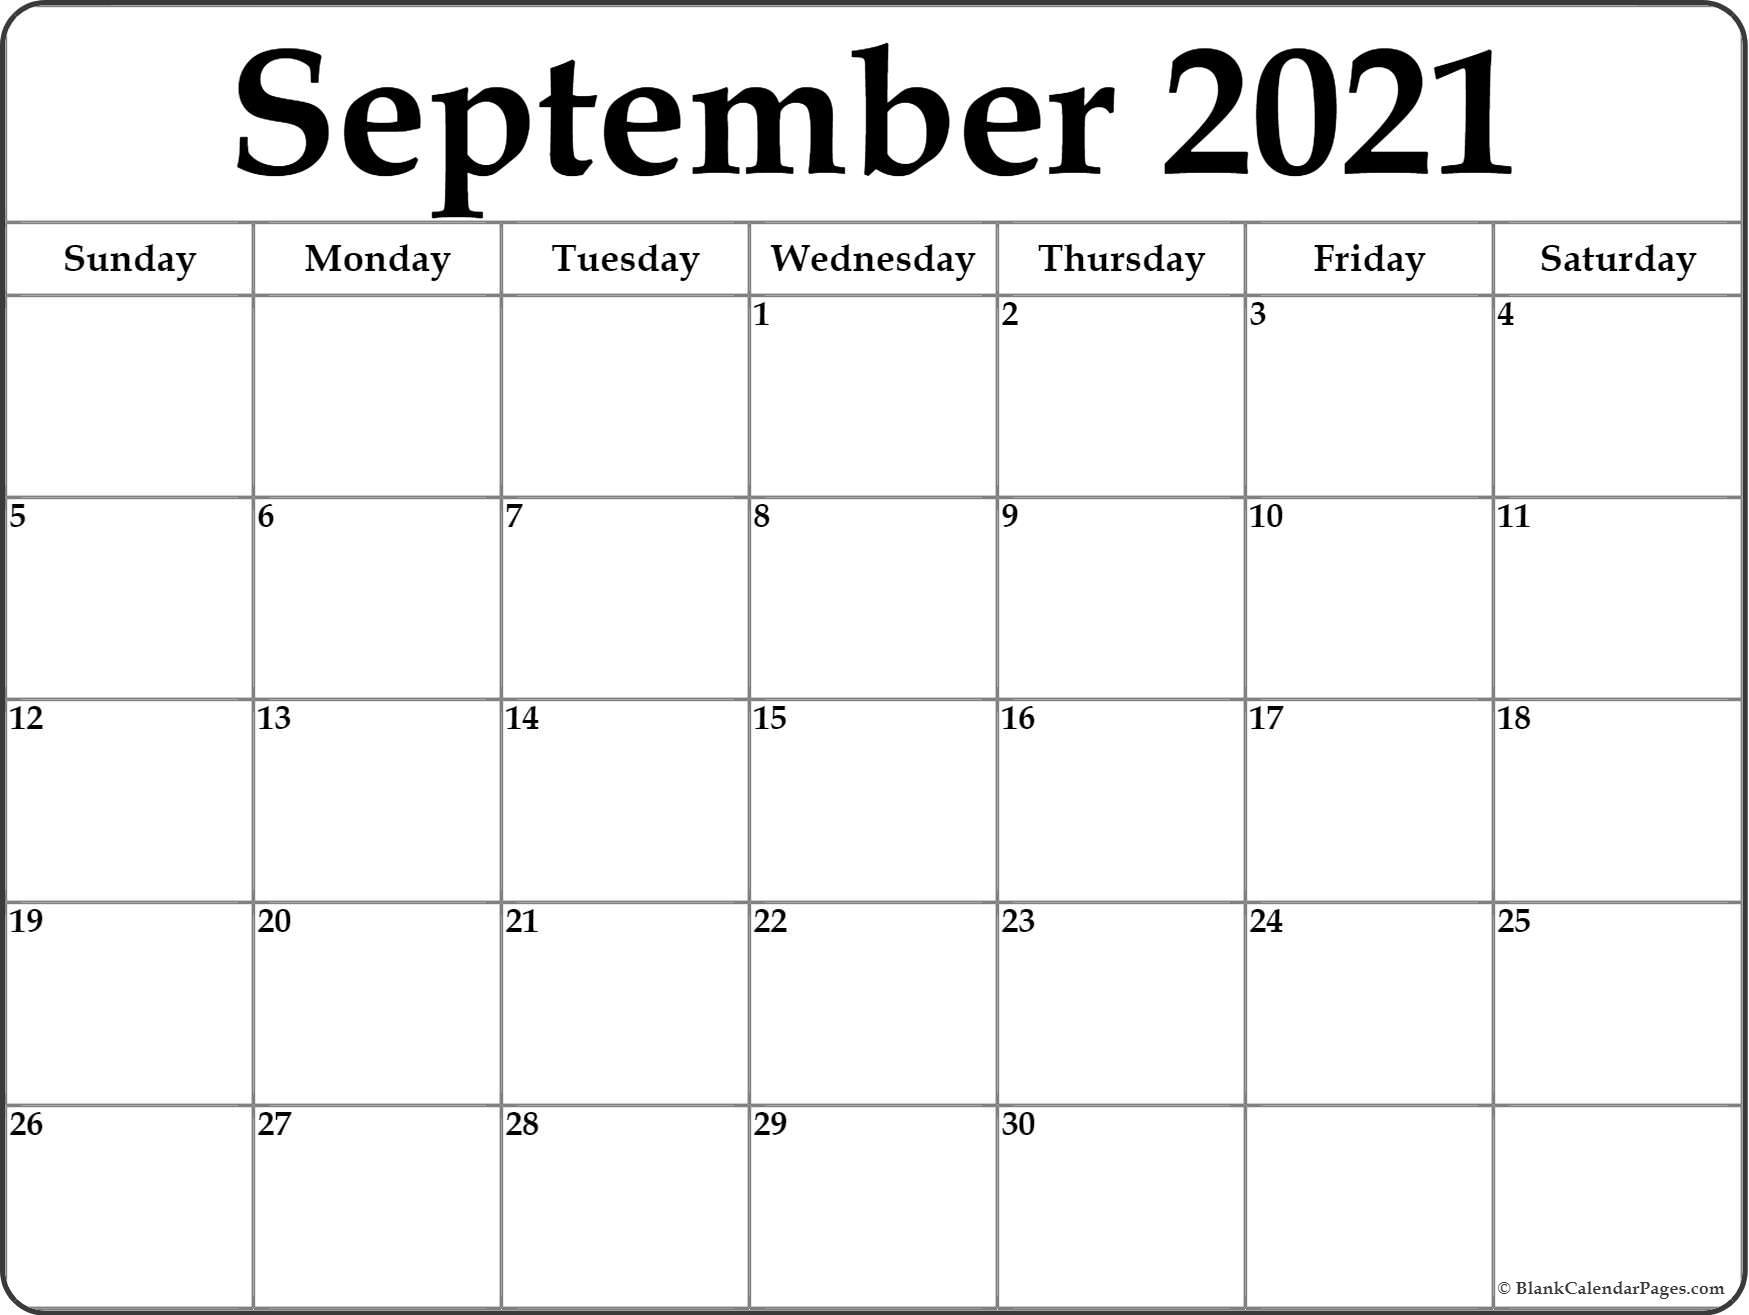 Get June – September 2021 Calendar Printable Free